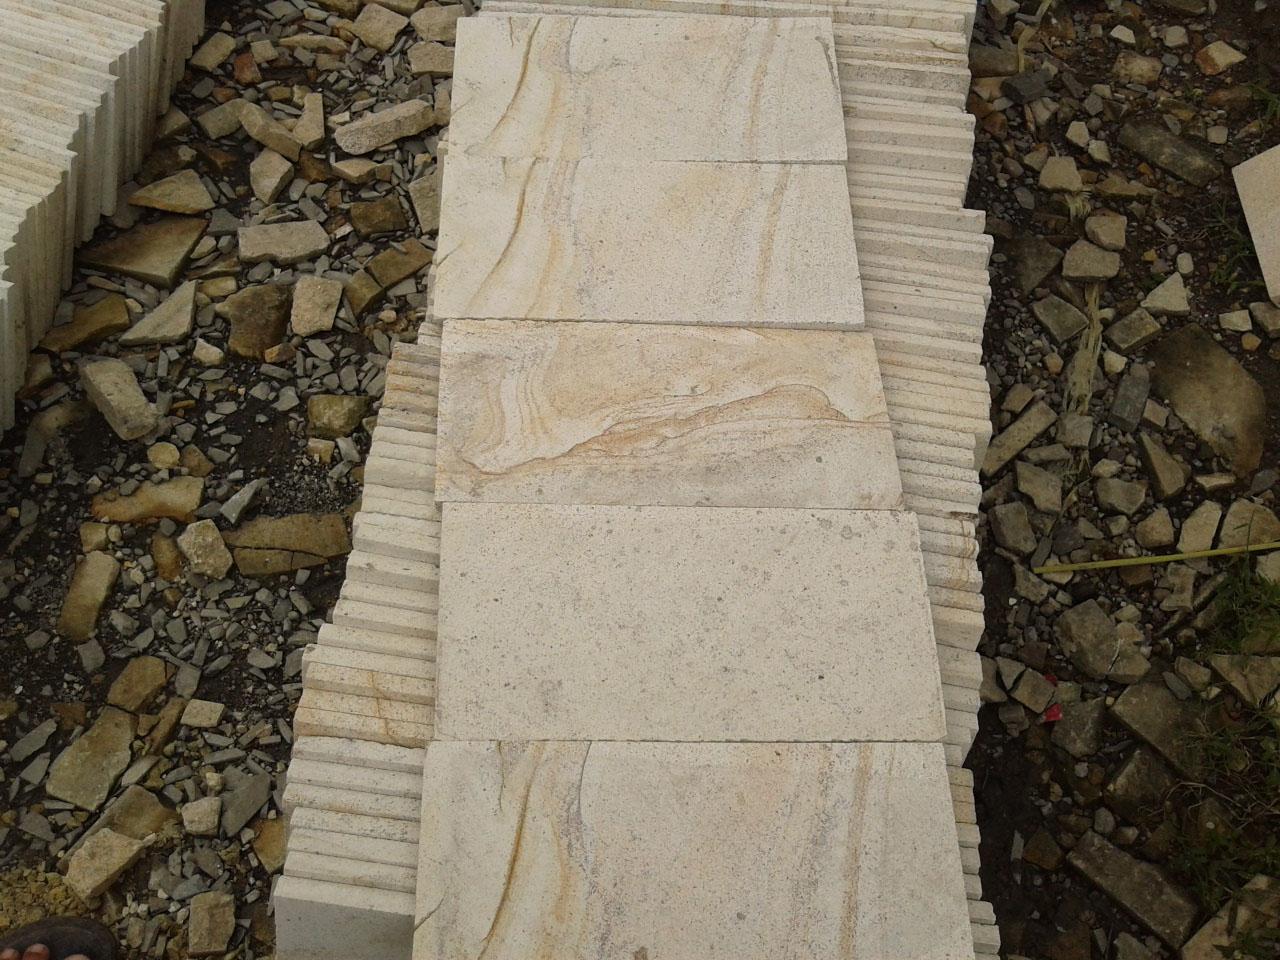 Sumber gambar : images.google.com | Batu Alam Palem Bobos